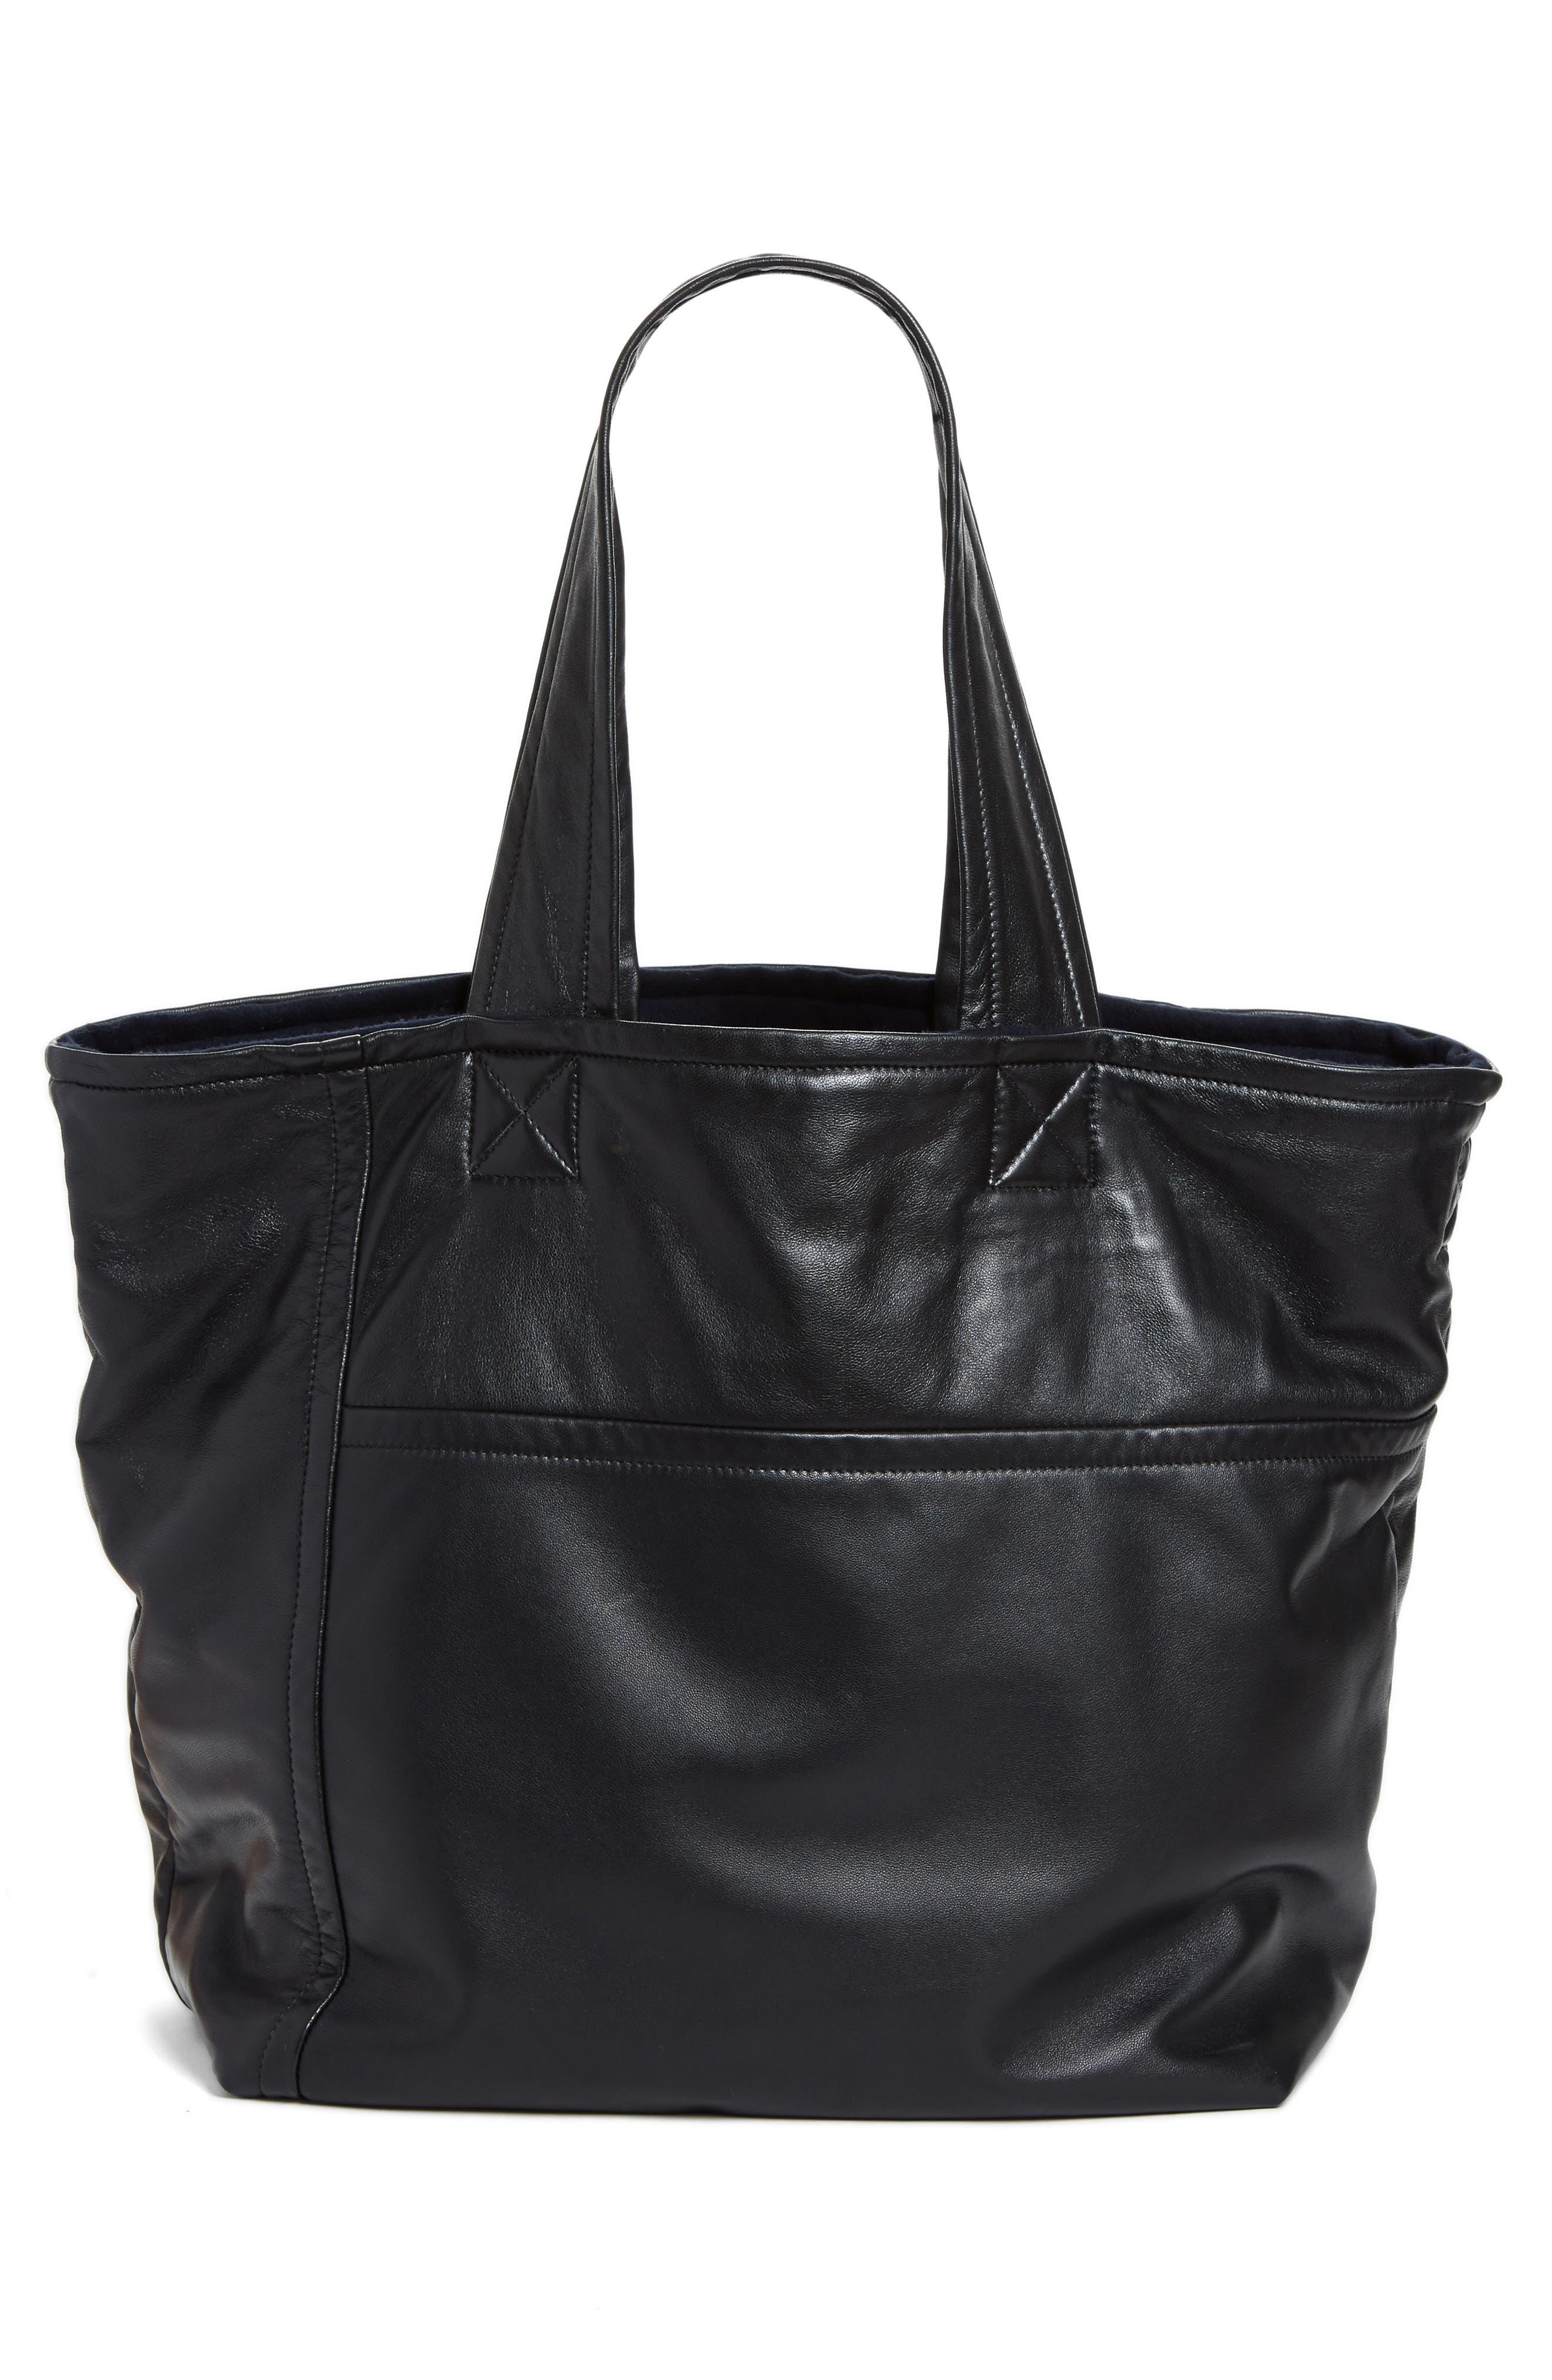 Sunday Bag,                             Alternate thumbnail 3, color,                             Black